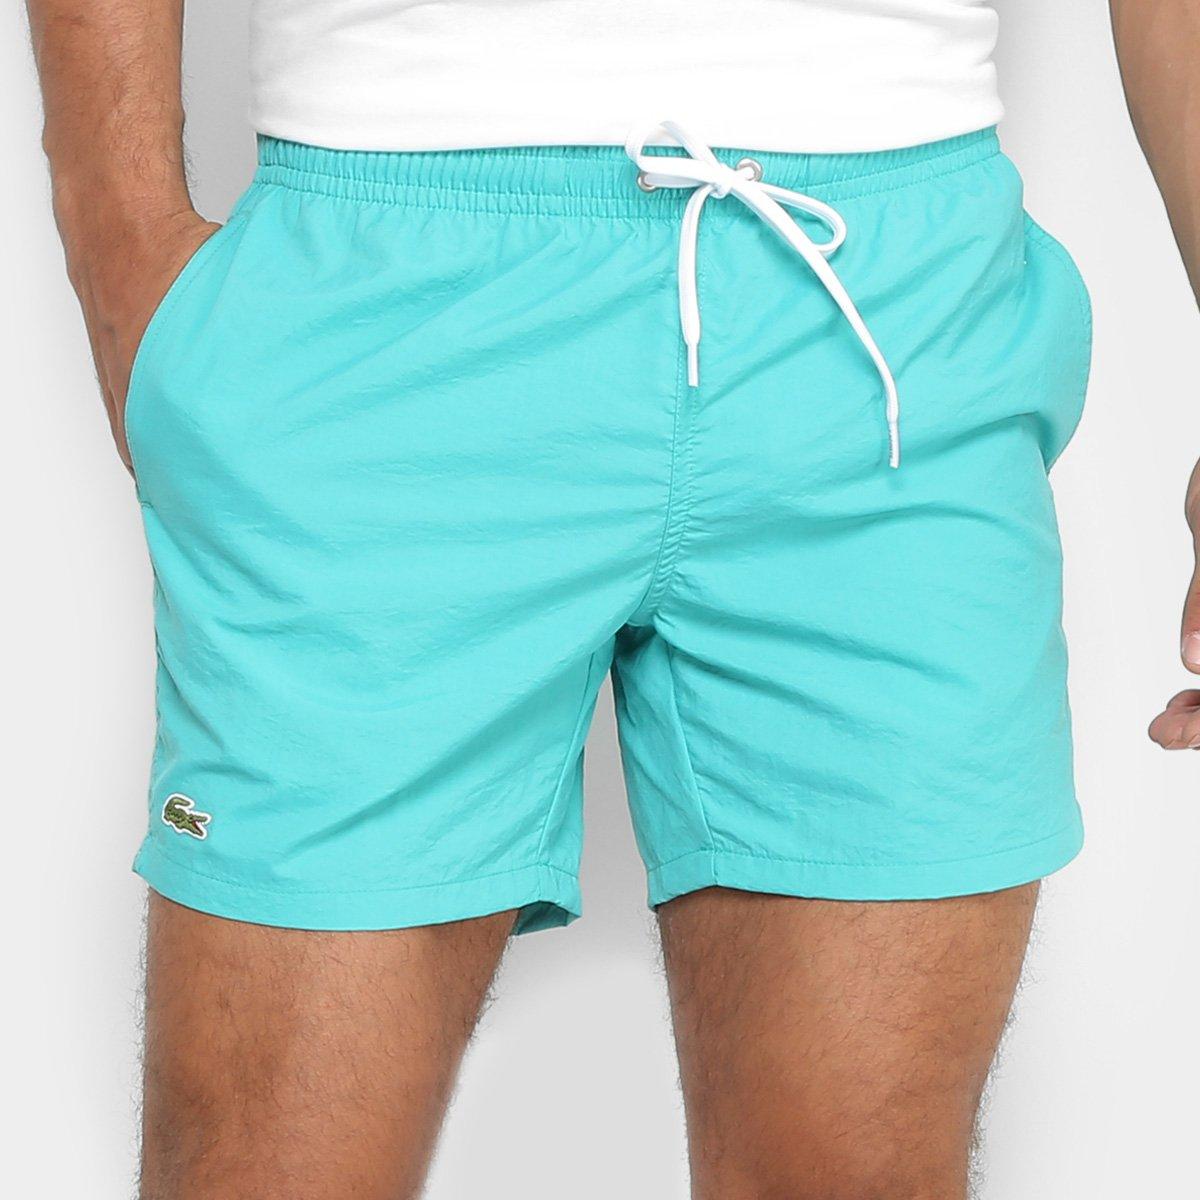 Bermuda dÁgua lacoste lisa masculina compre agora netshoes jpg 1200x1200 Bermudas  masculinas lacoste ed54a9fccc5